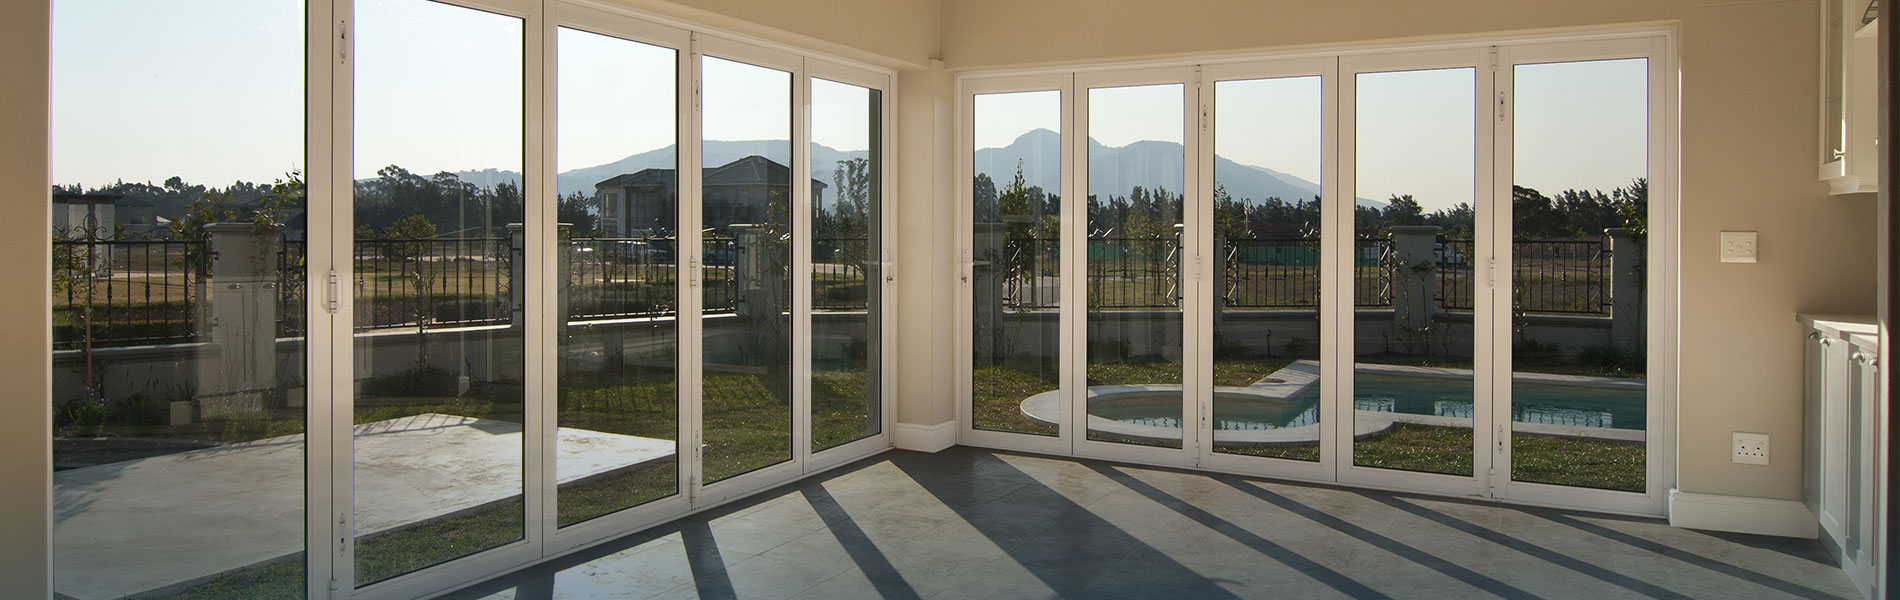 Residential Gl And Window Repairs In Bakersfield Ca